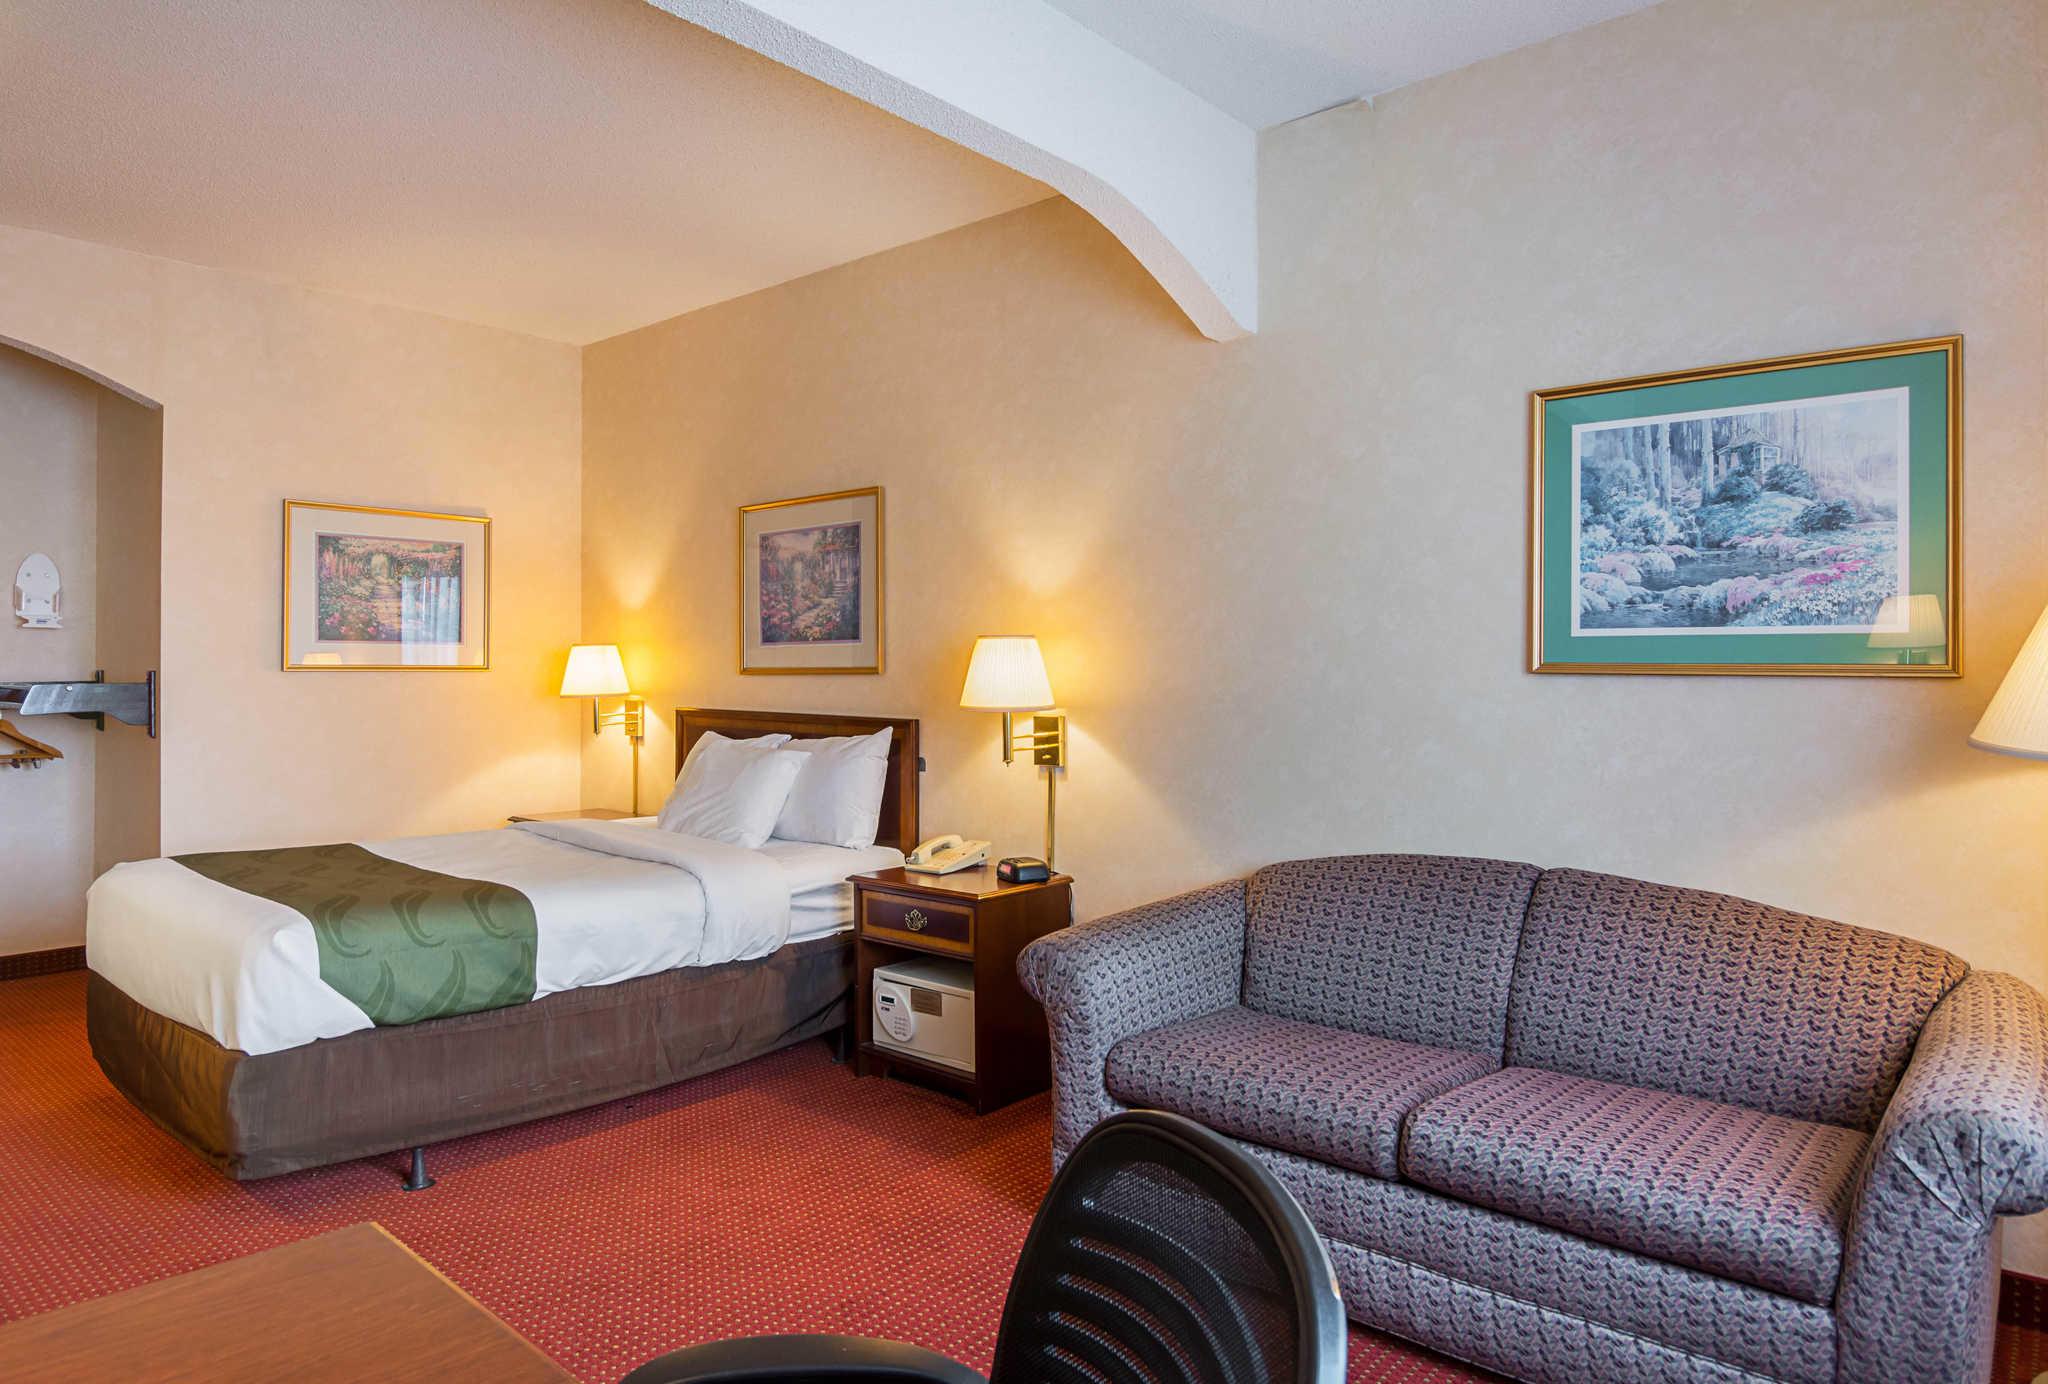 Quality Inn & Suites Kearneysville - Martinsburg image 13